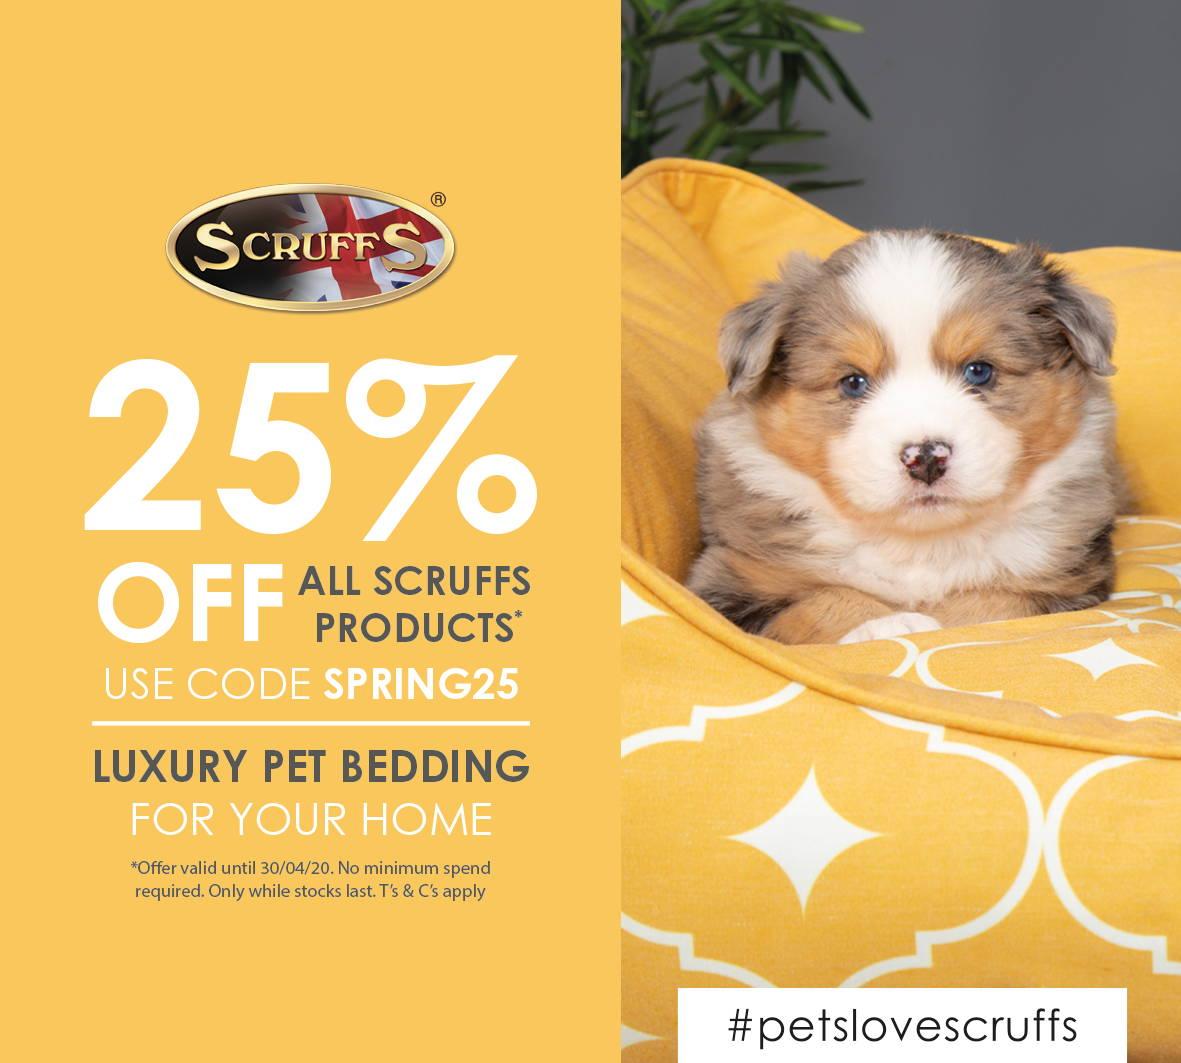 25% off all Scruffs bedding in April 2020